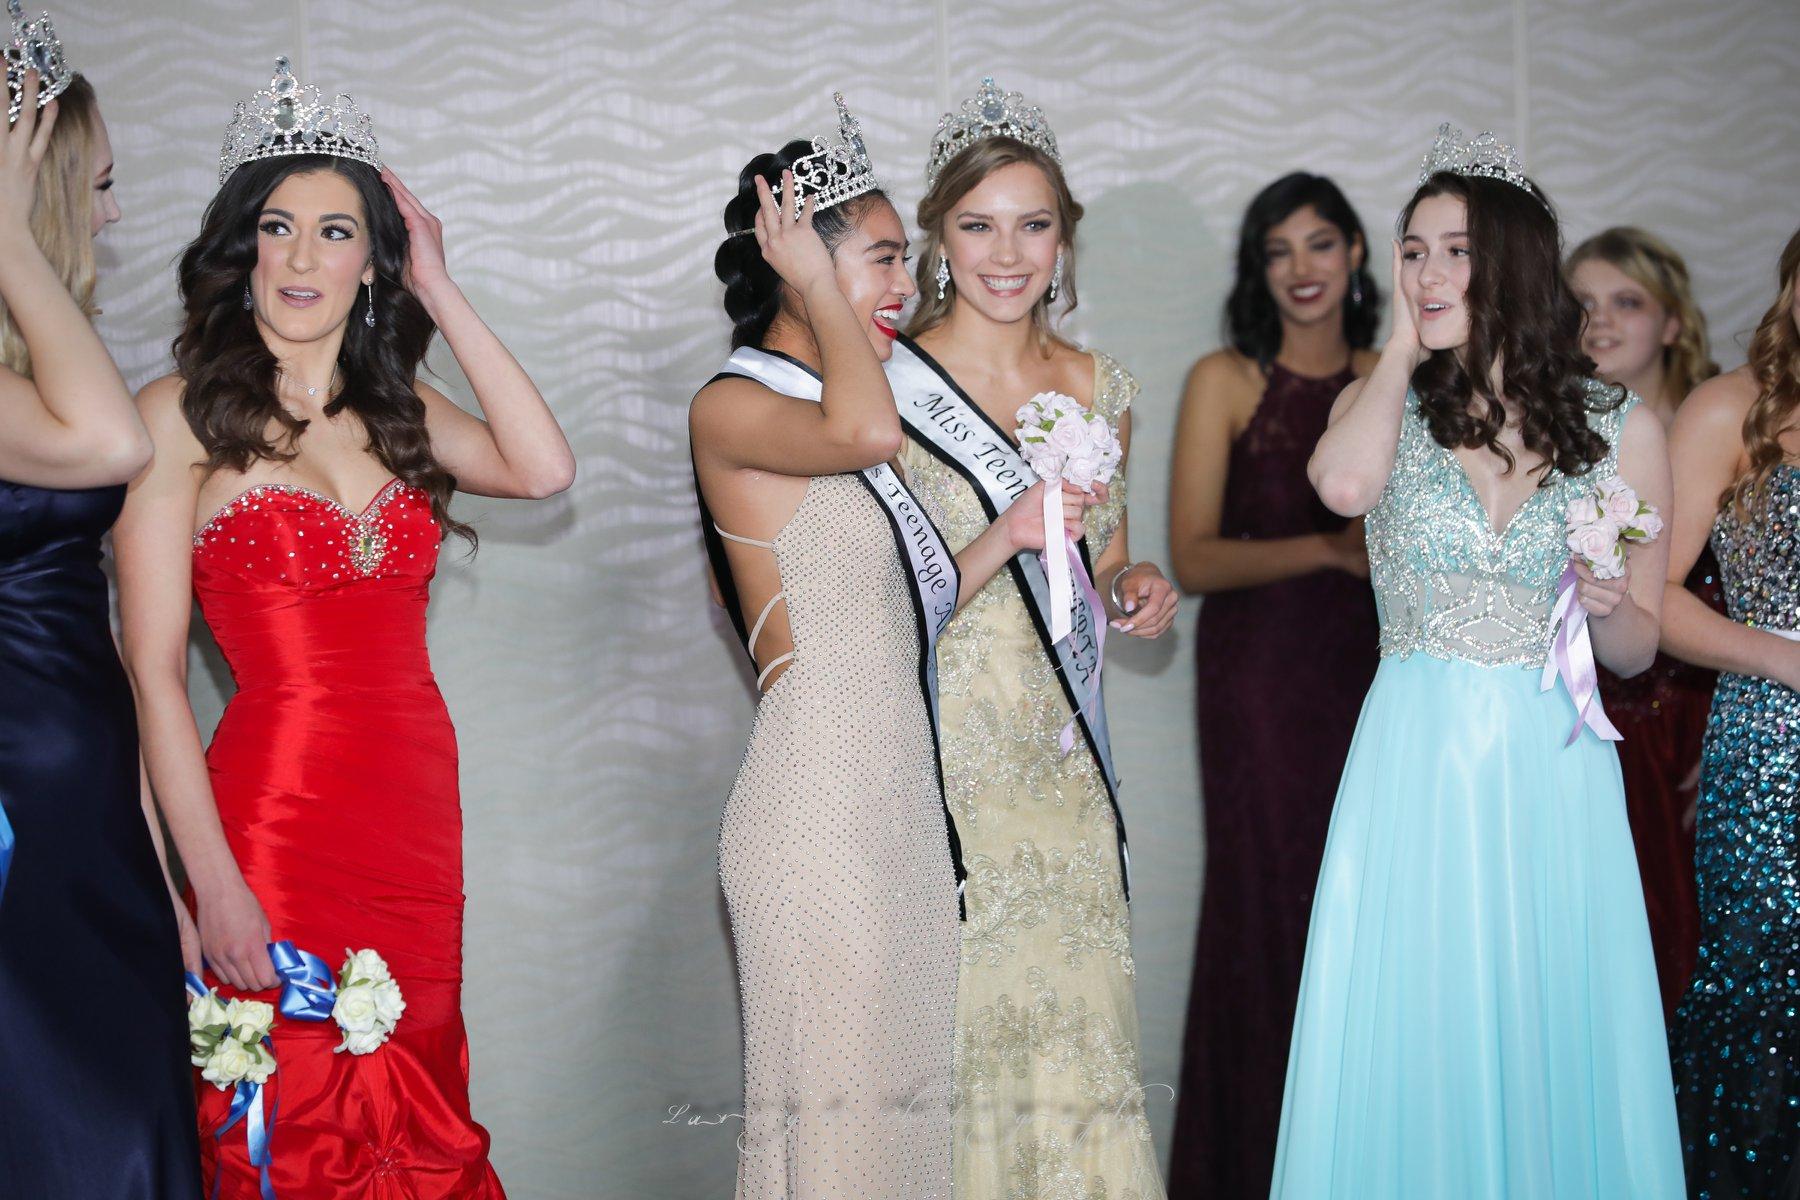 Maliyah - Miss Teenage Alberta 2018 - APRIL 14-15